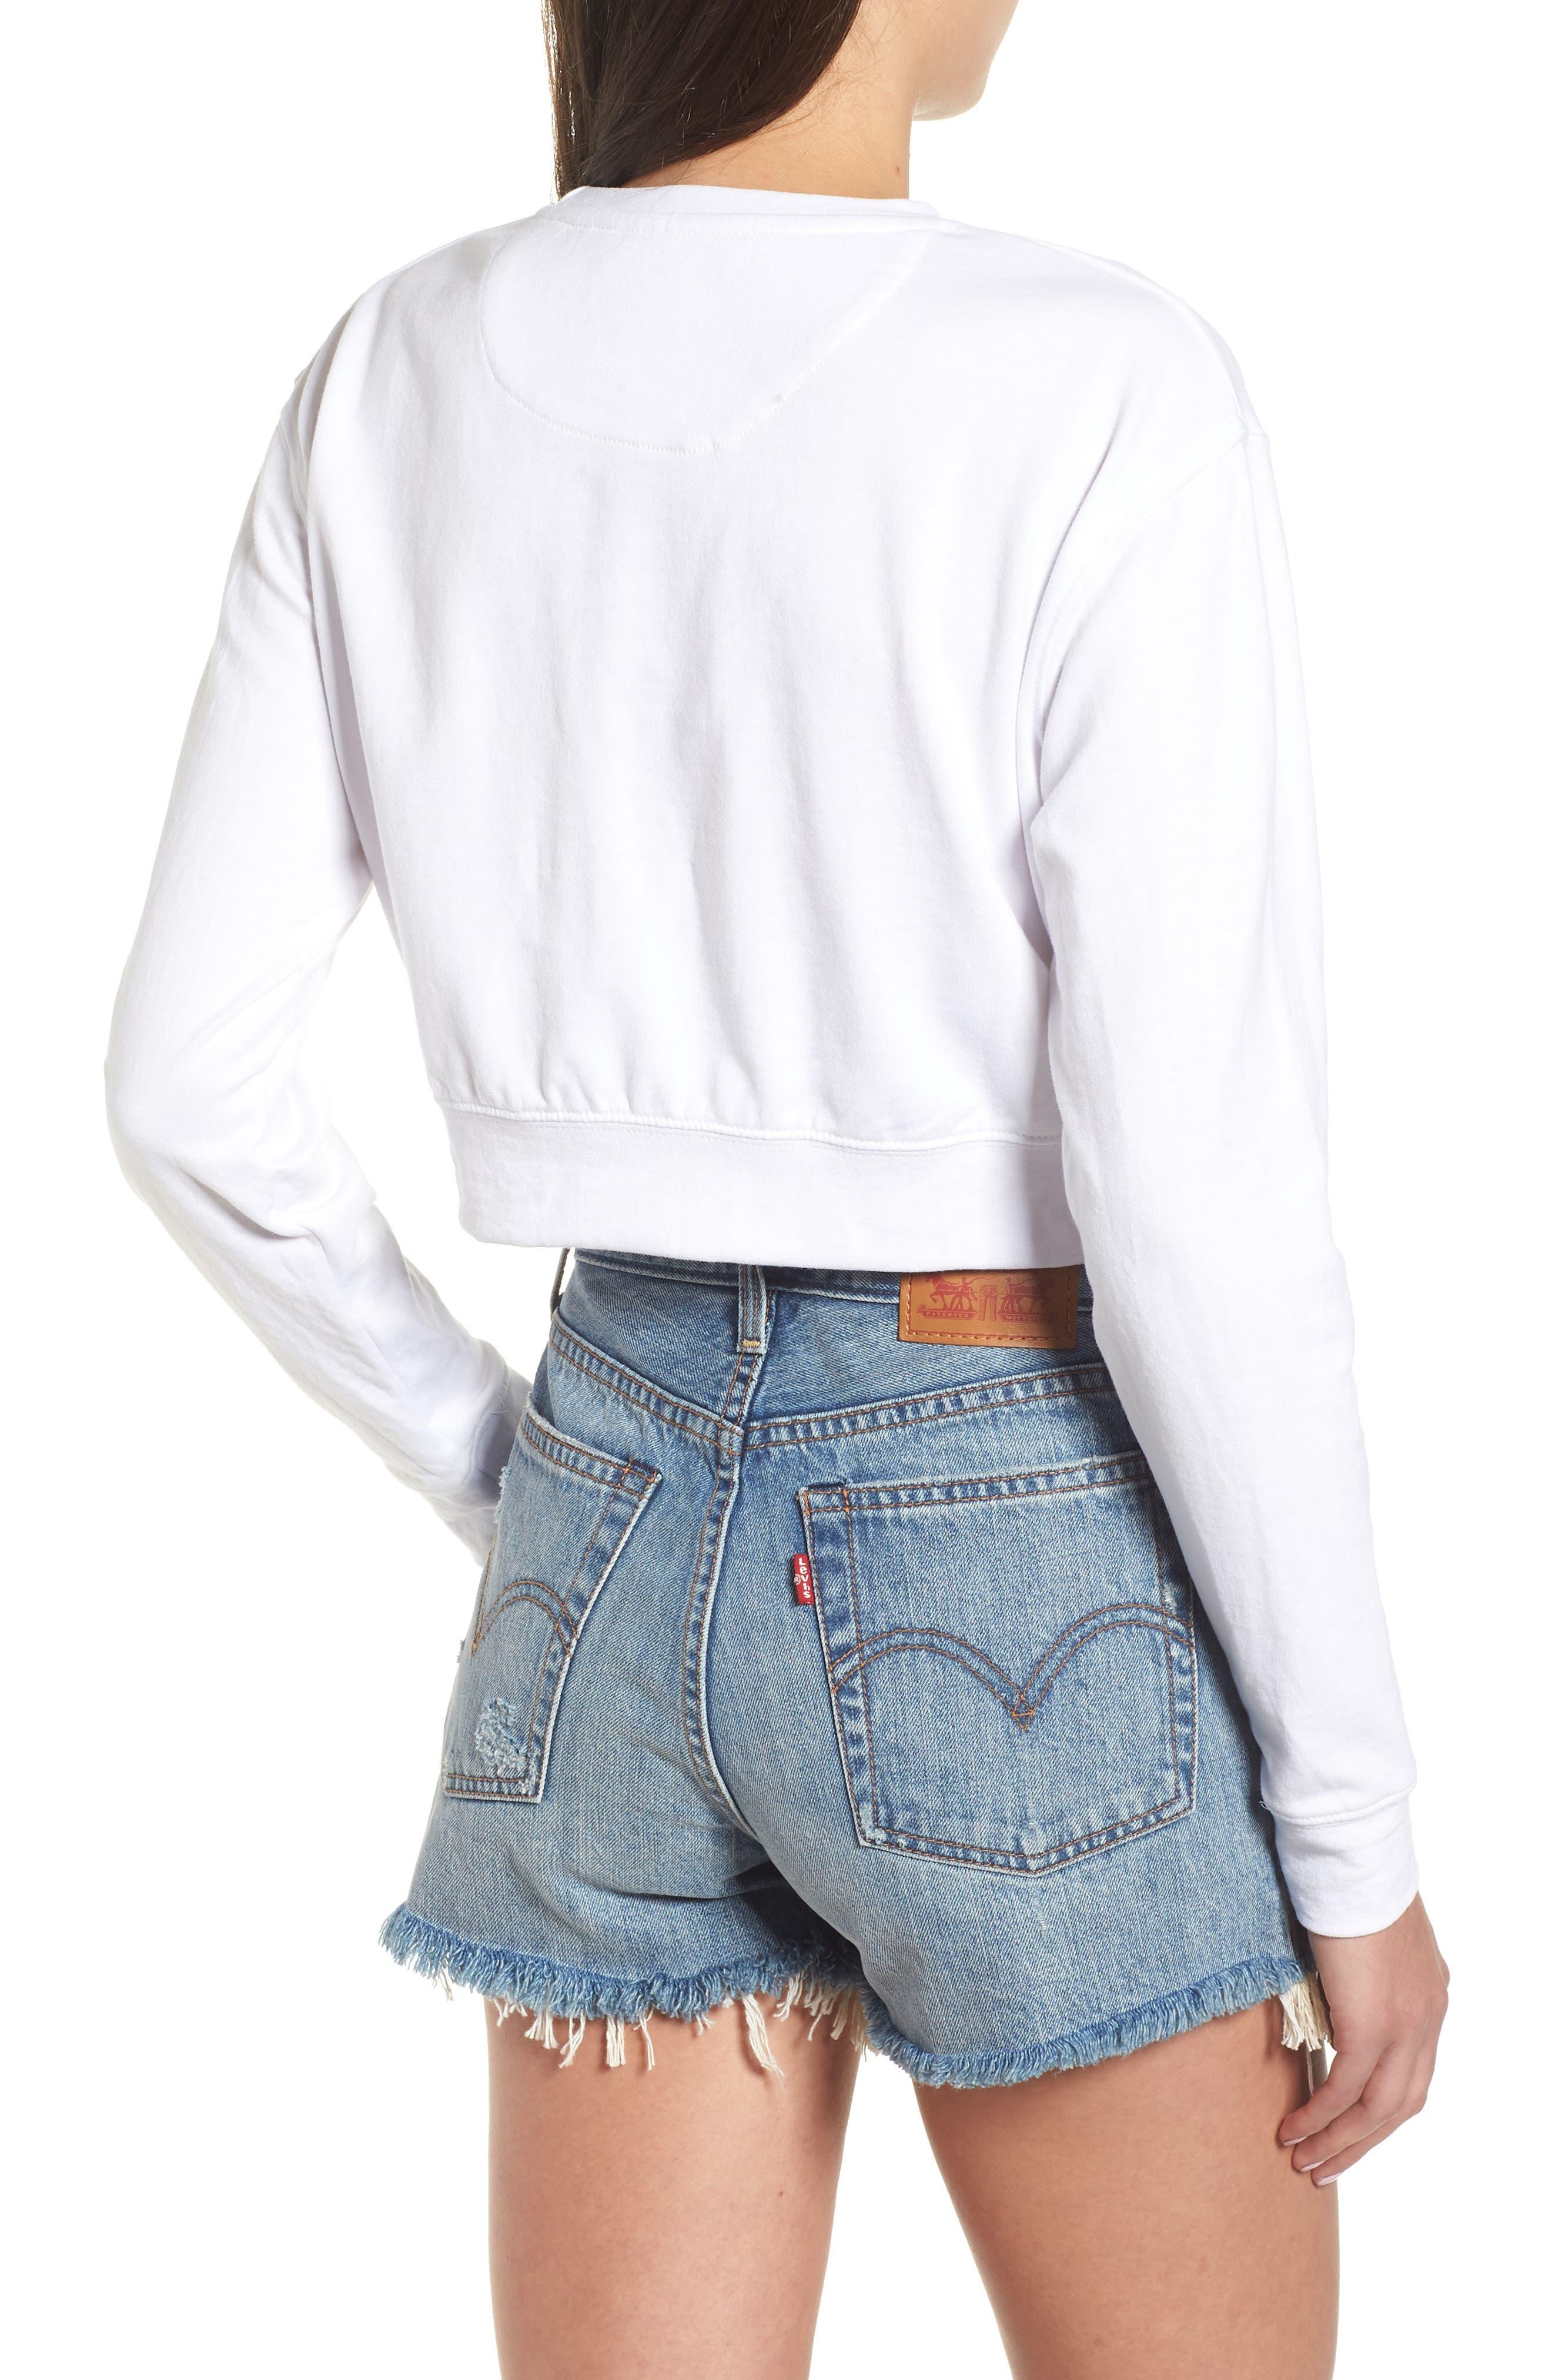 Bamm Bamm Crop Sweatshirt,                             Alternate thumbnail 2, color,                             White